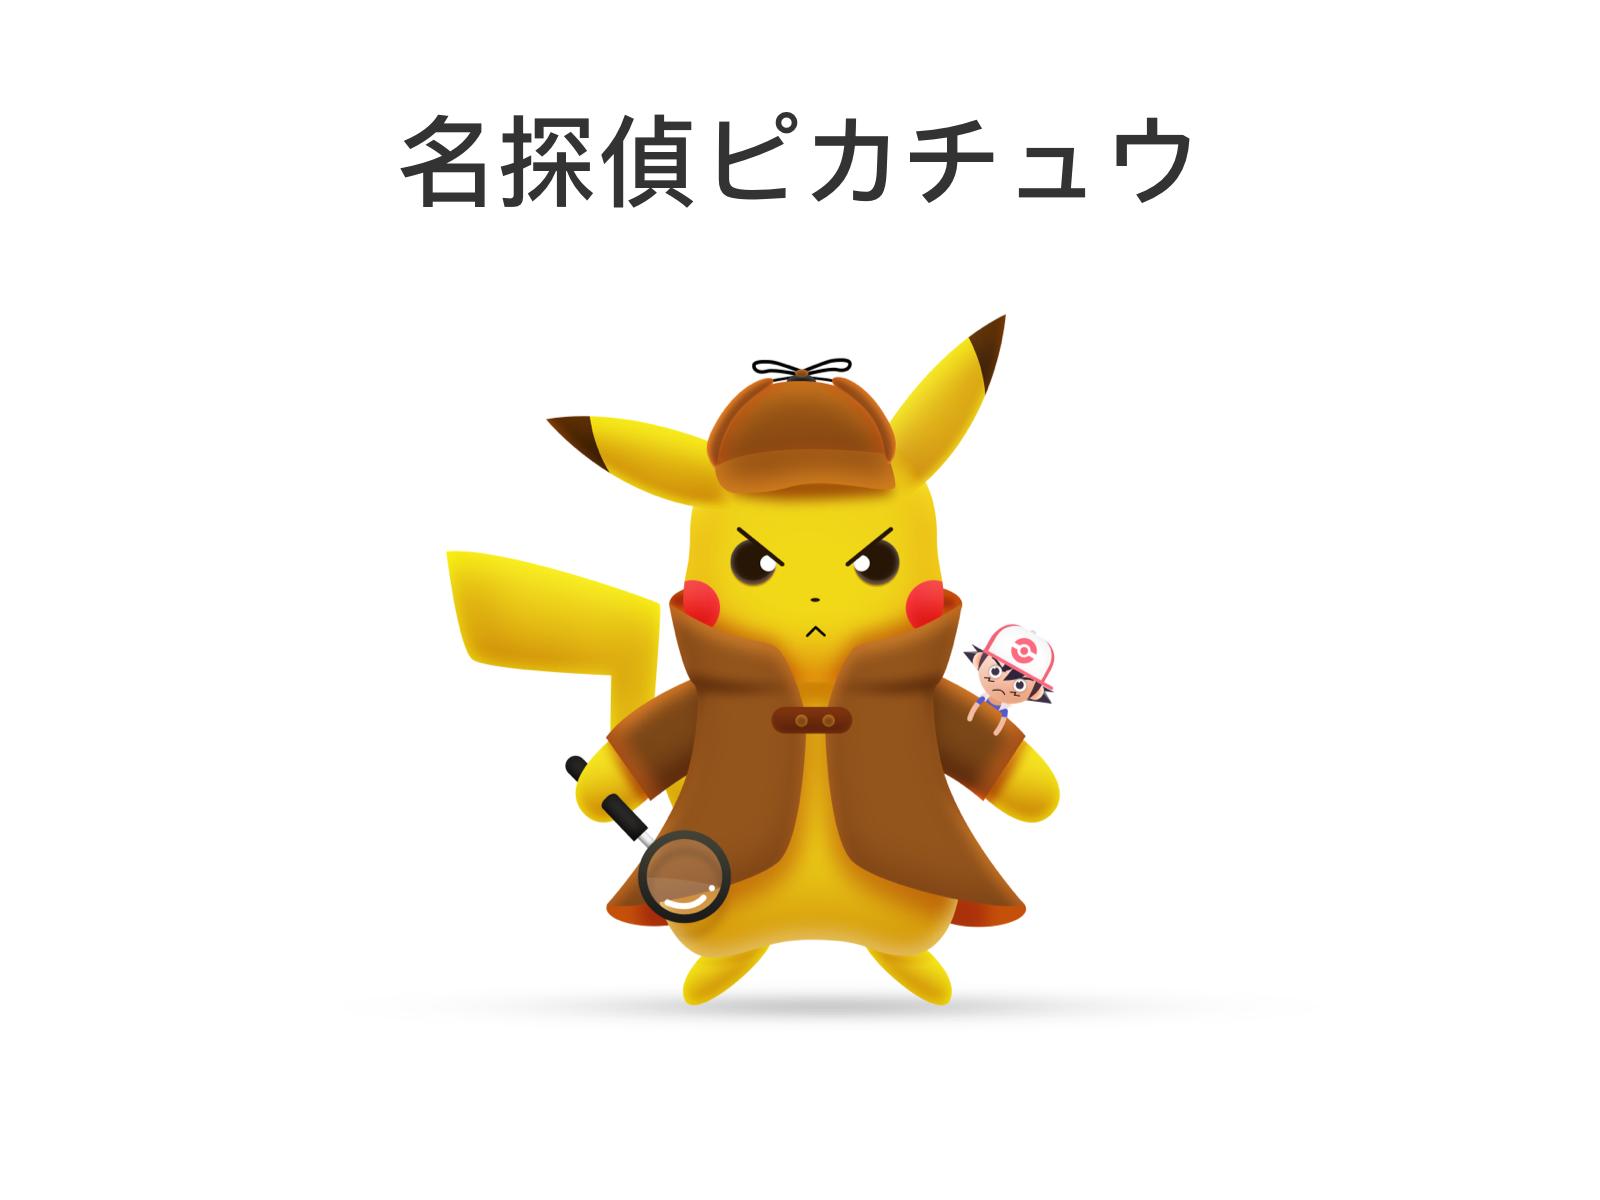 Detective Pikachu Pikapika Pikachu Detective Saint Charles